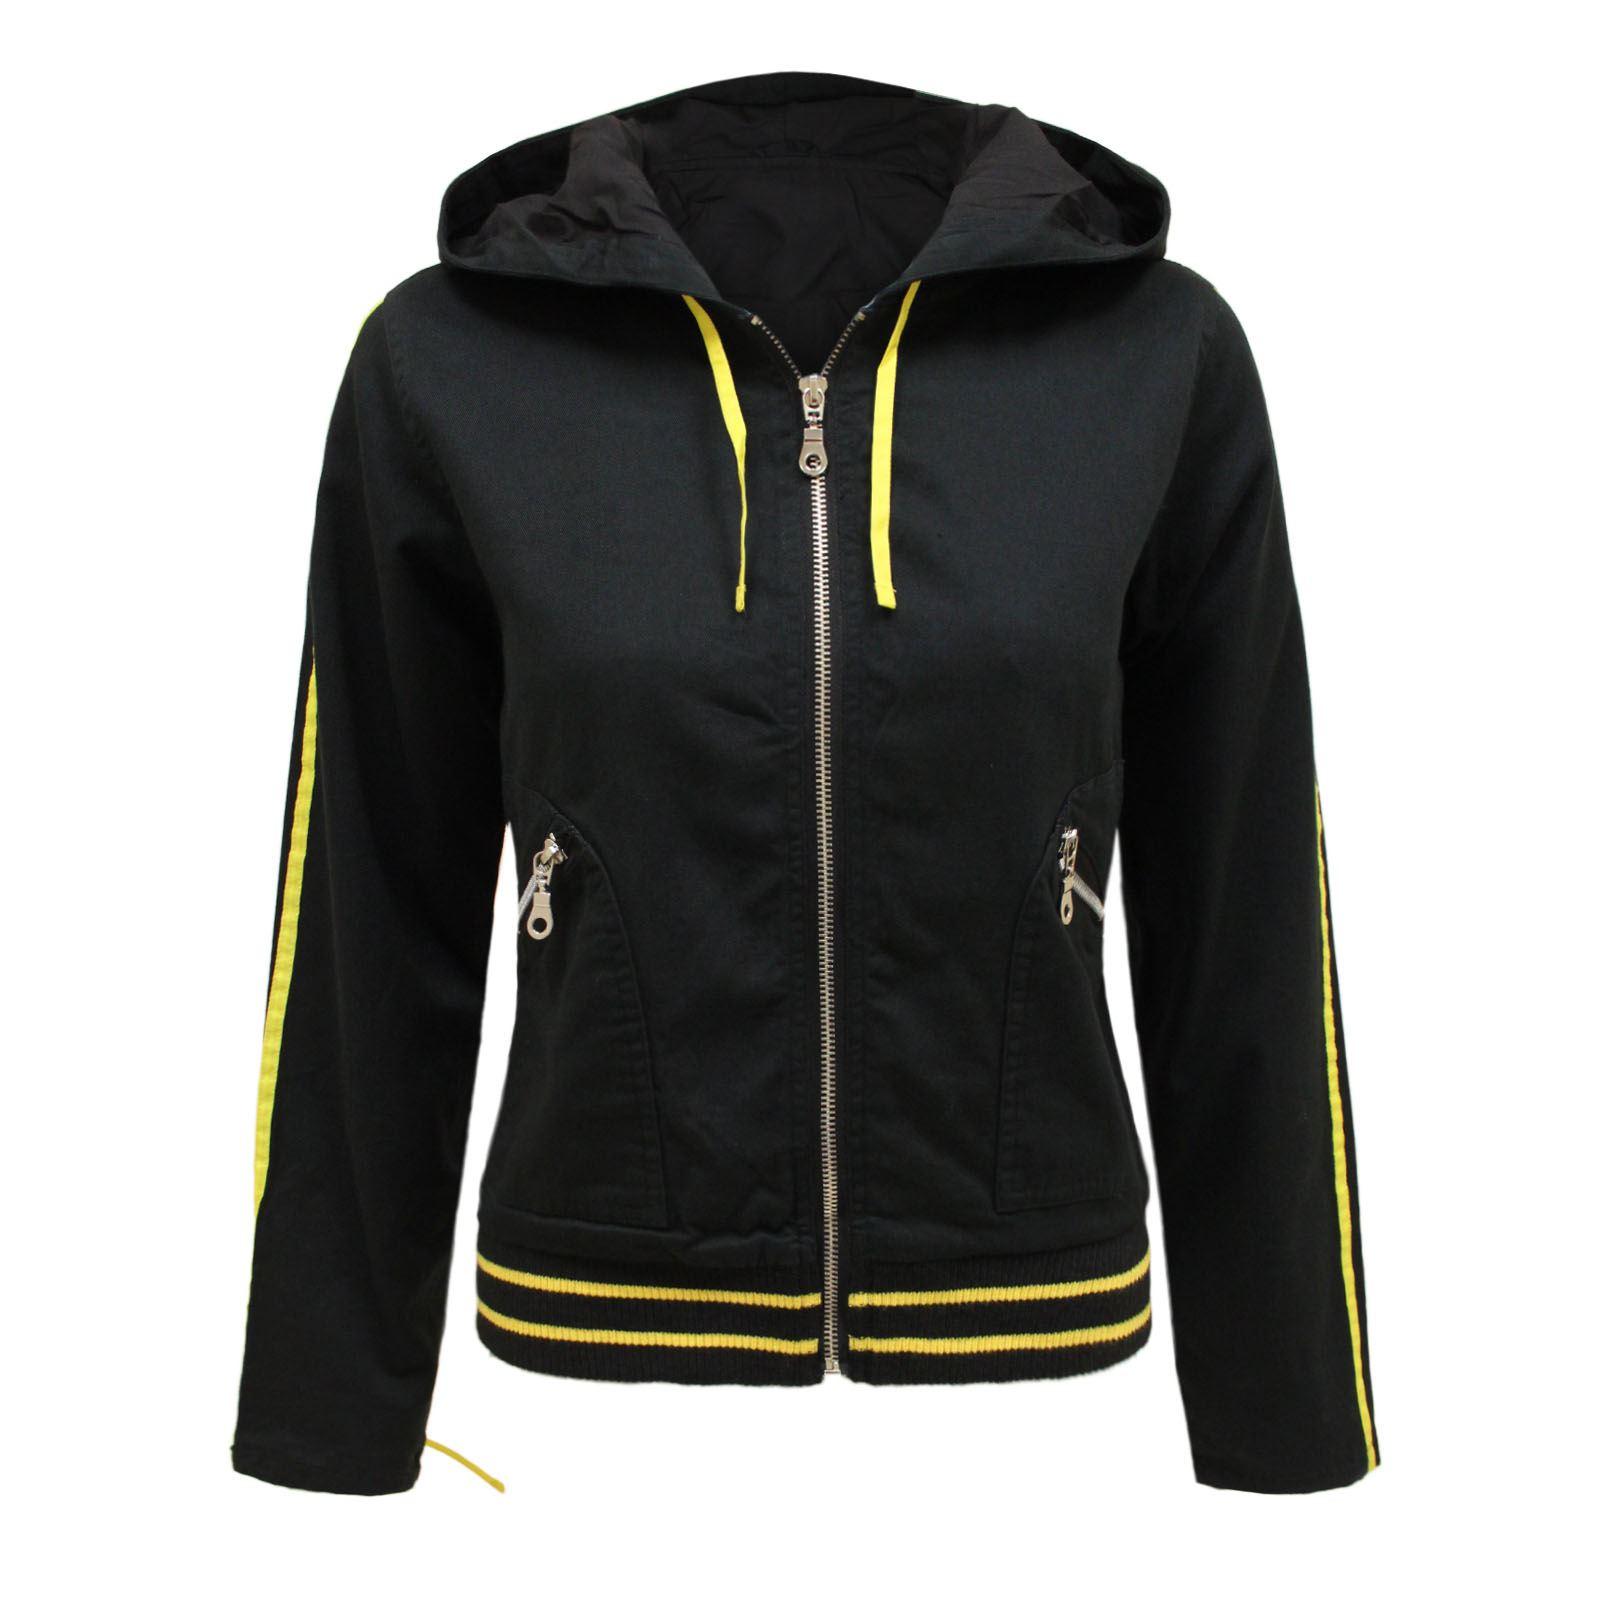 Womens zip up jackets